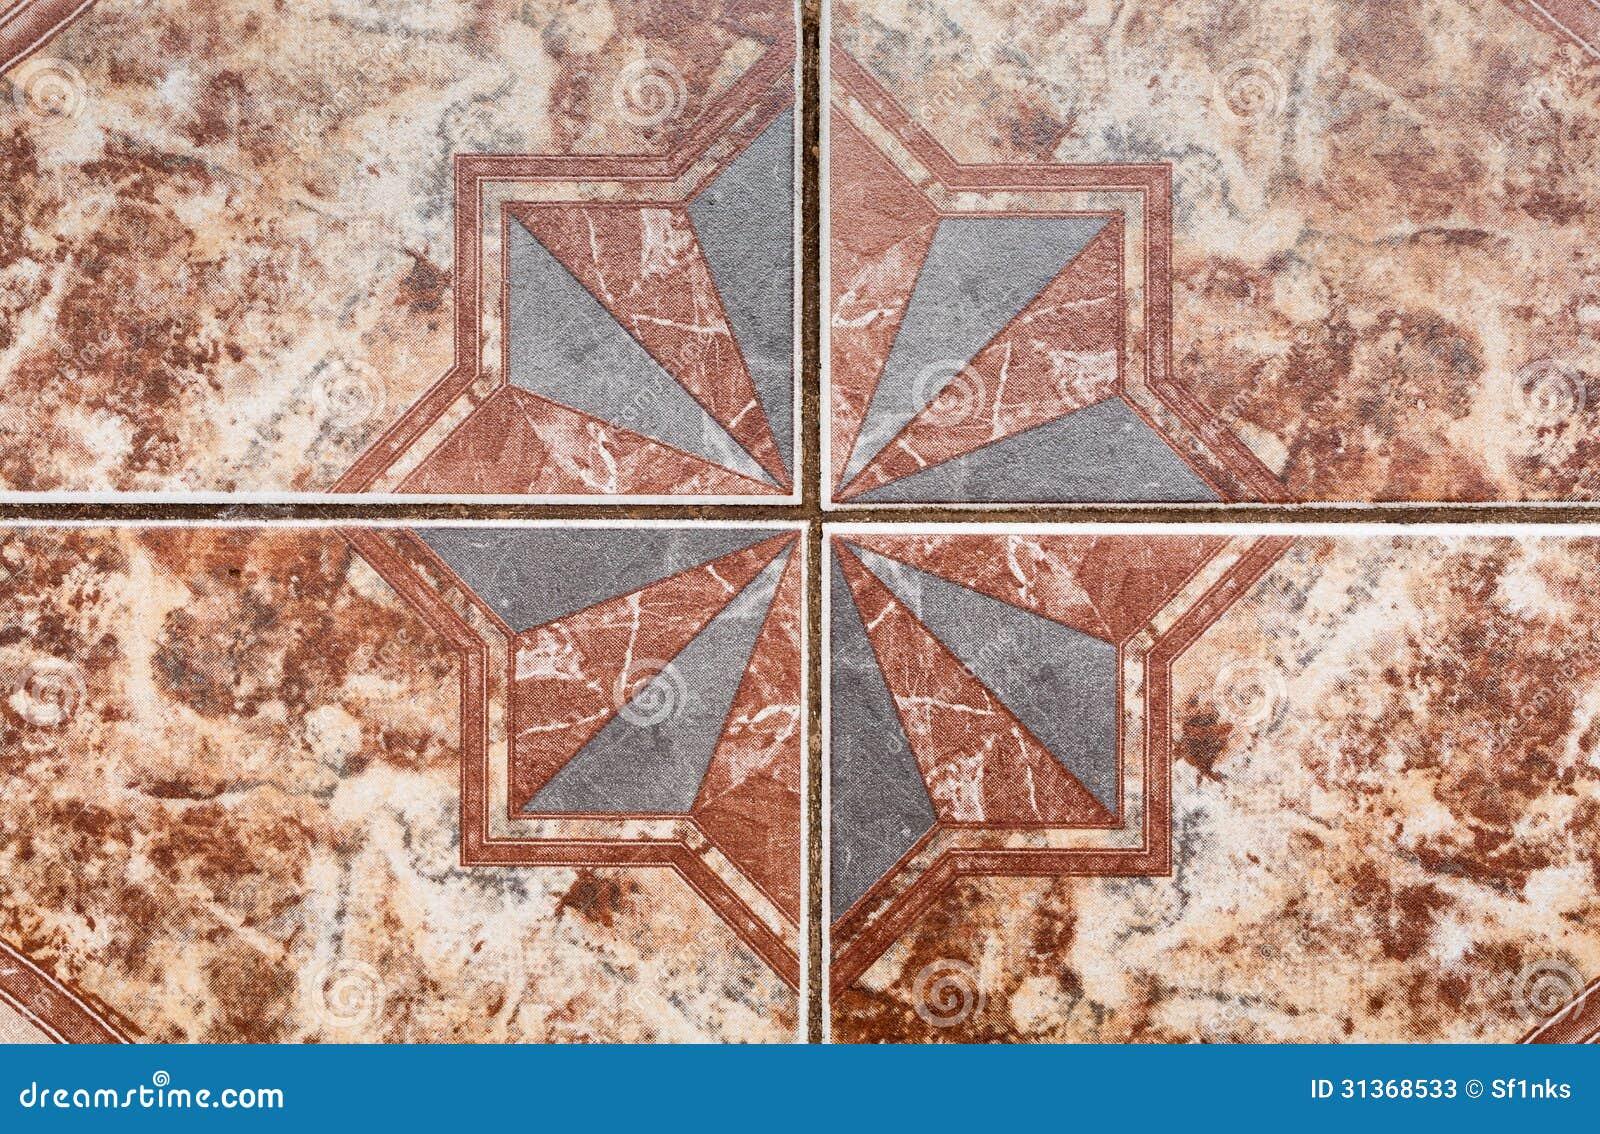 Tile Pattern Of Ancient Ceramic Tiles. Stock Image - Image of mosaic ...